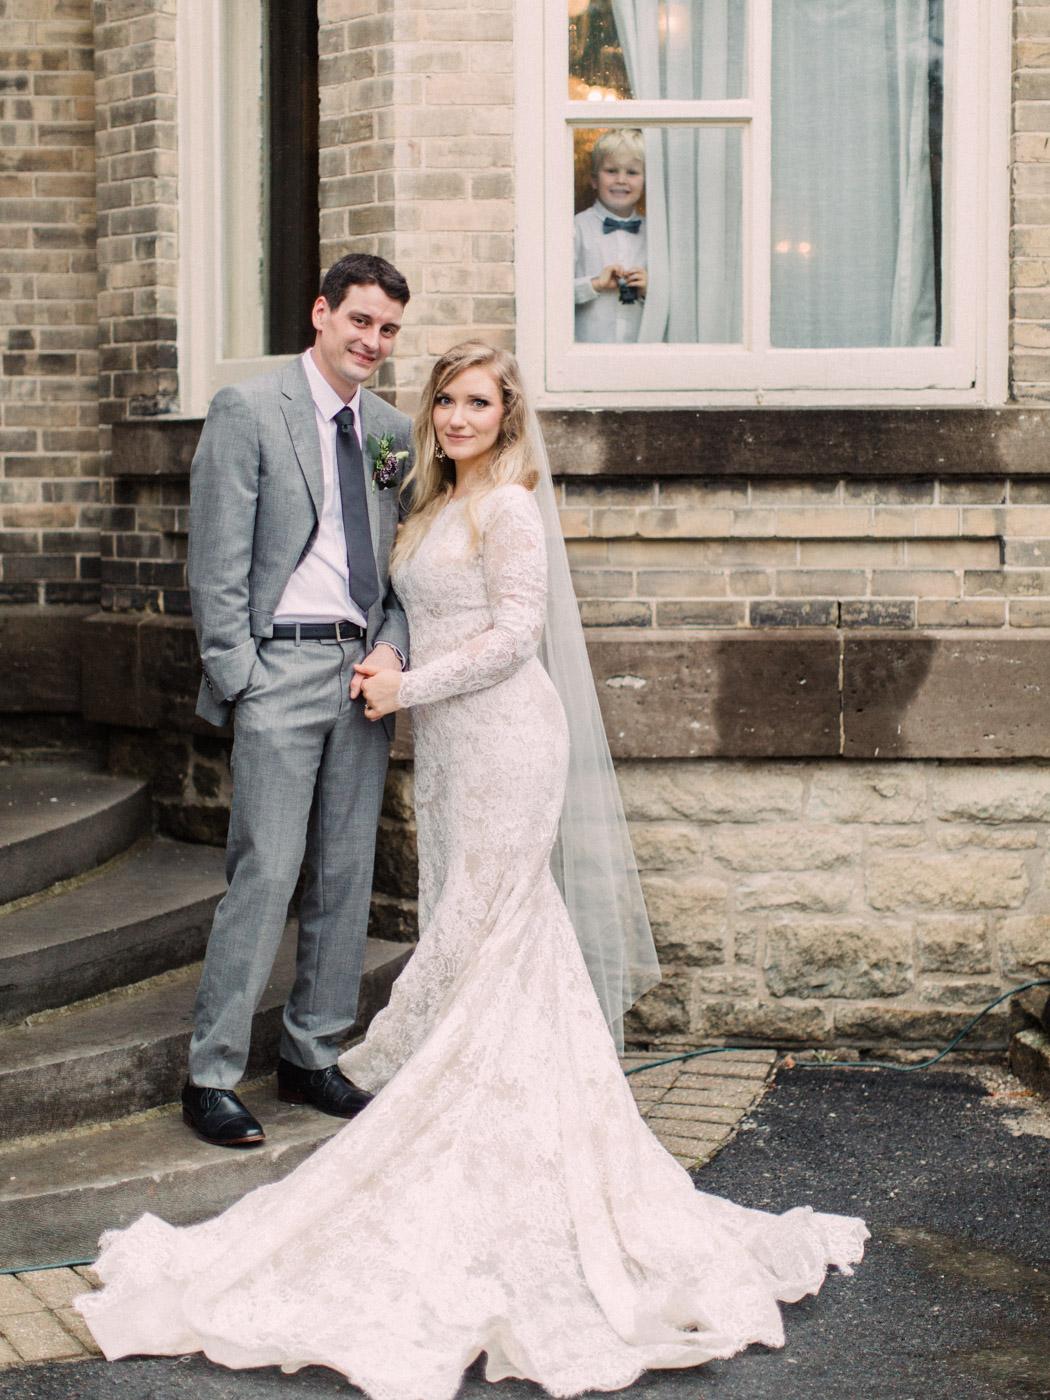 Toronto-wedding-photographer-intimate-classic-fine-art-elopement-ottawa54.jpg